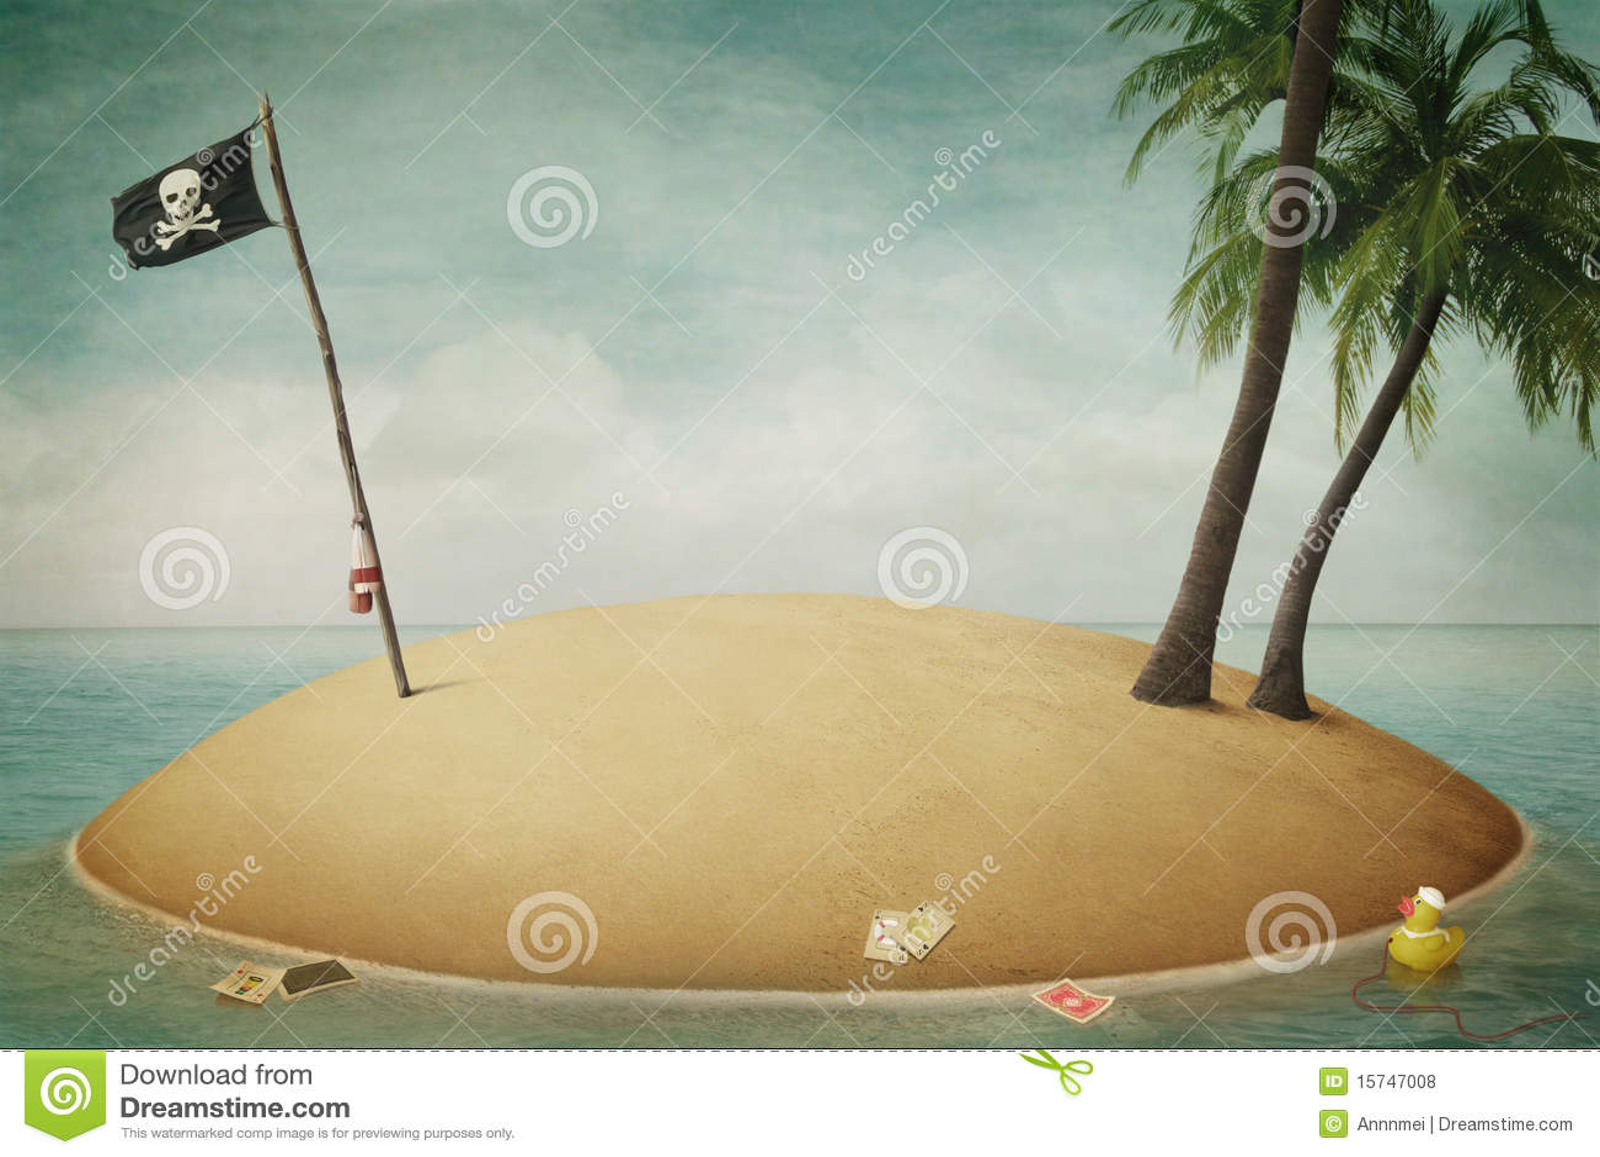 Download Island, Pirates, Adventure And Sea Stock Illustration - Illustration of design, pastel: 15747008